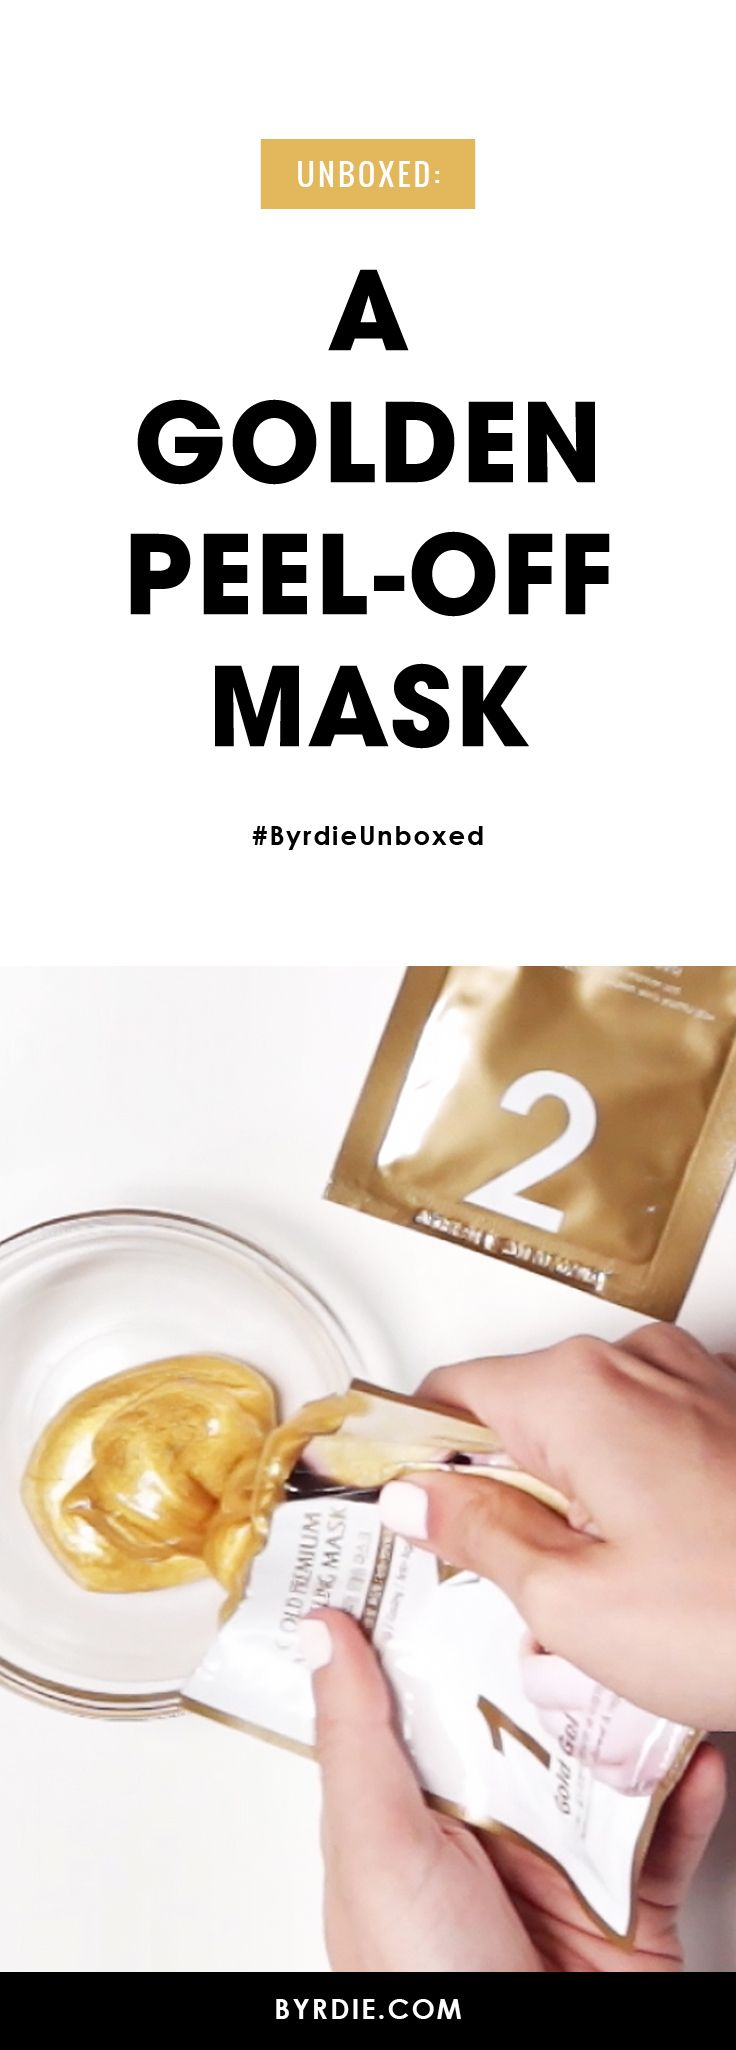 1000 ideas about charcoal peel off mask on pinterest peel off mask nose strips for. Black Bedroom Furniture Sets. Home Design Ideas